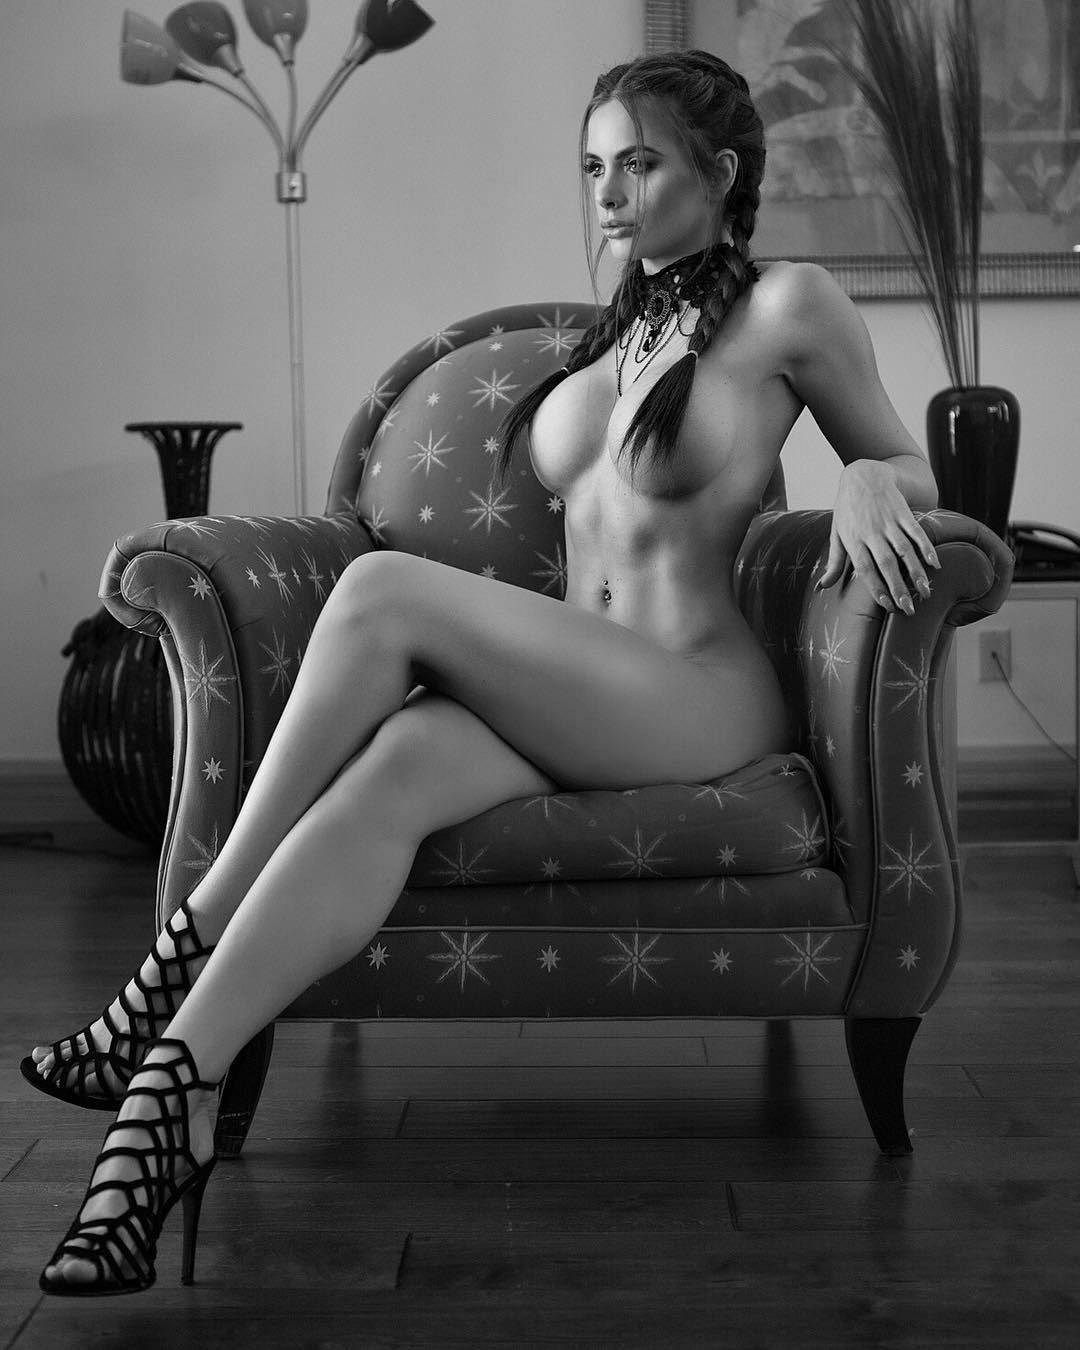 Allison Parker Nude Photos, Big Boobs